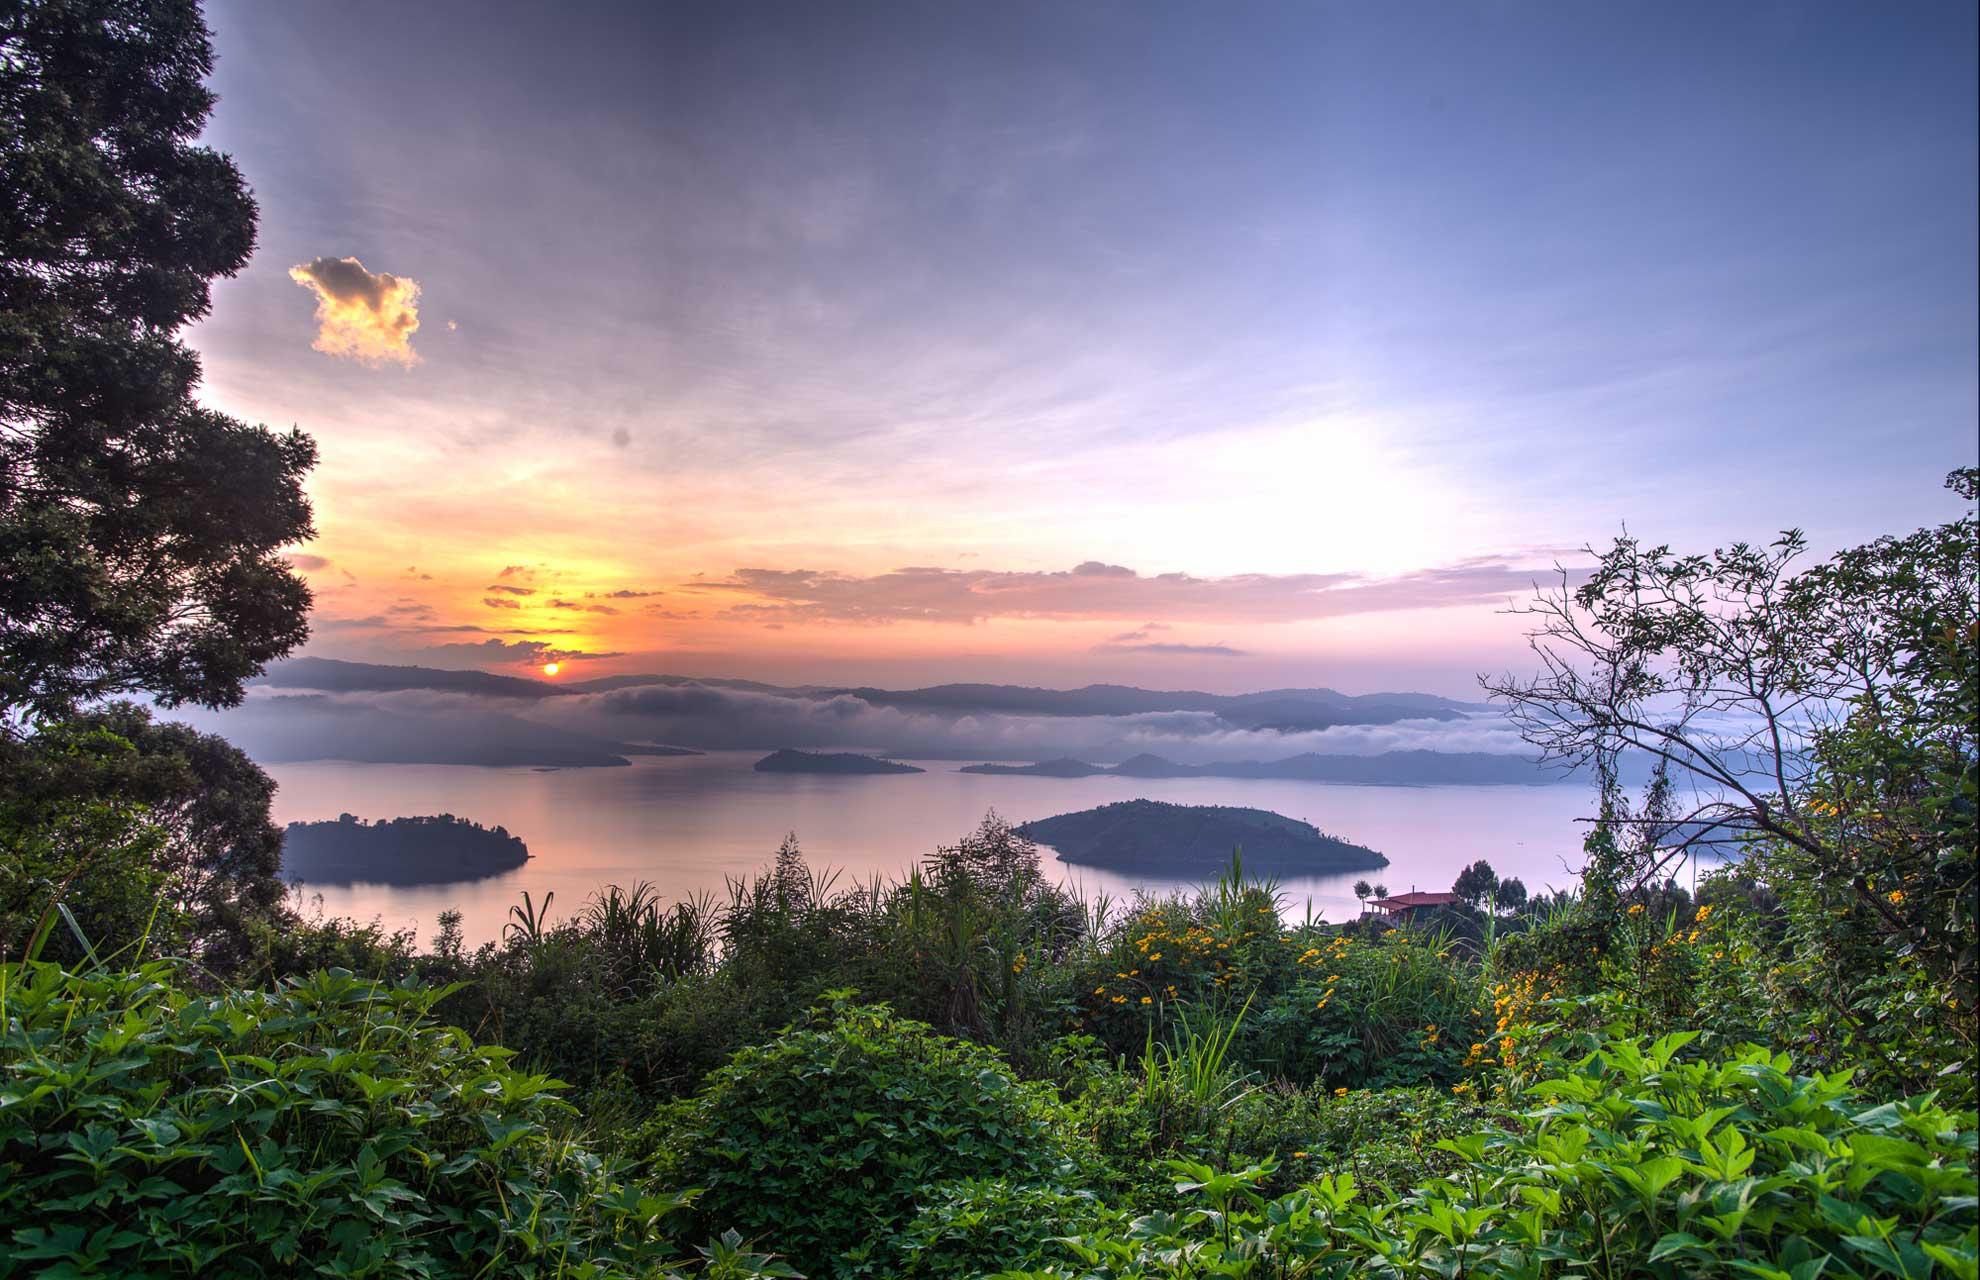 Holidays to dream of in Rwanda and Uganda